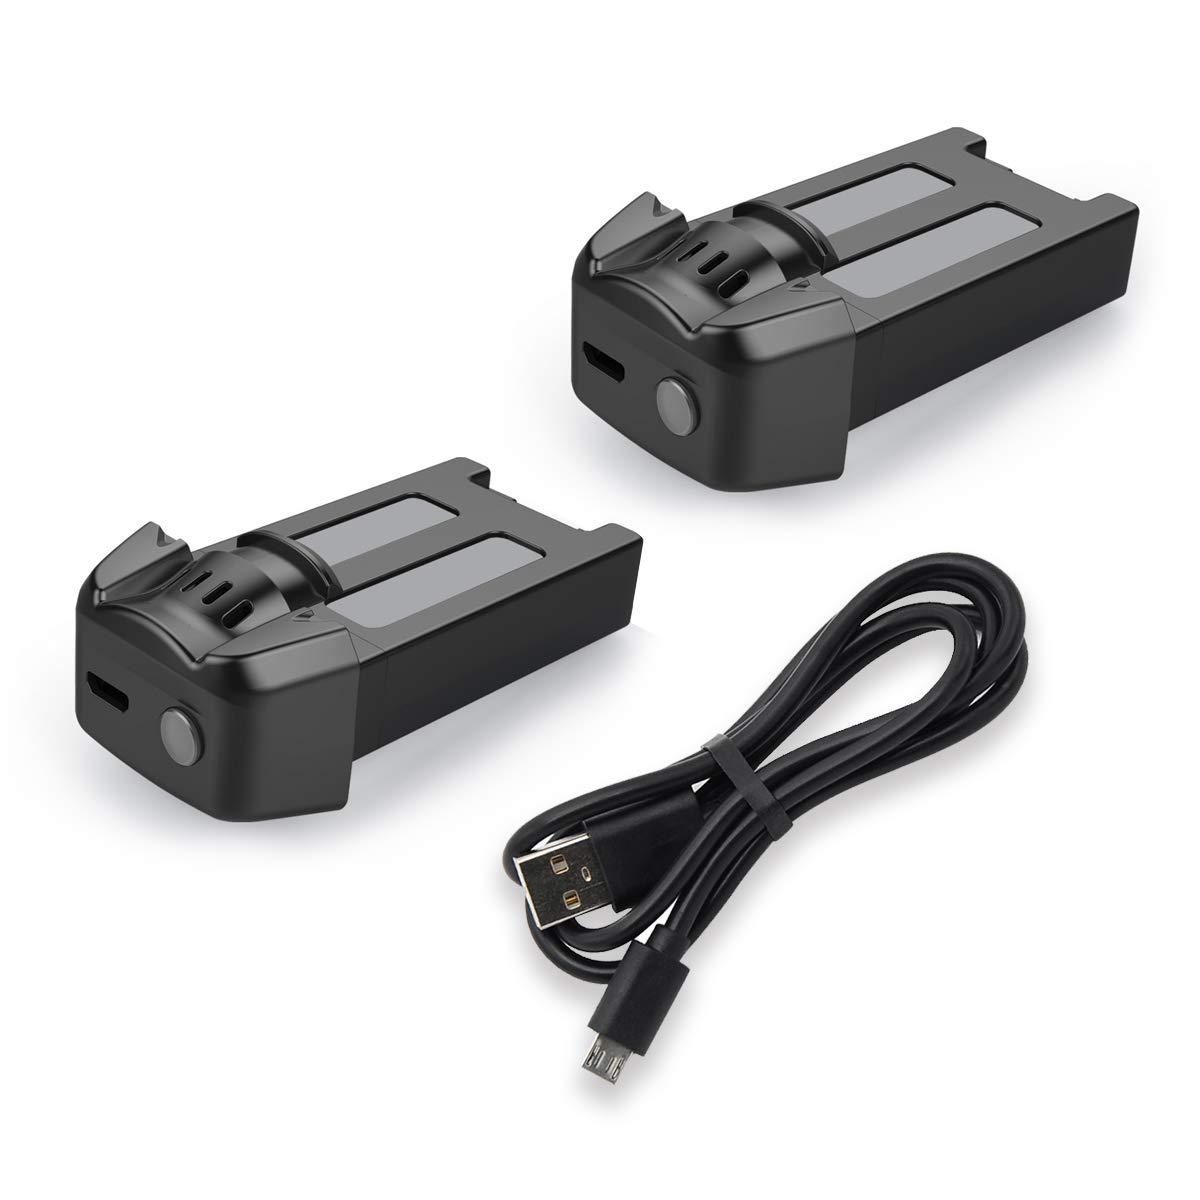 Potensic T18 Original Battery Modular 3.7V 1000mAh - Pack of 2 by Potensic